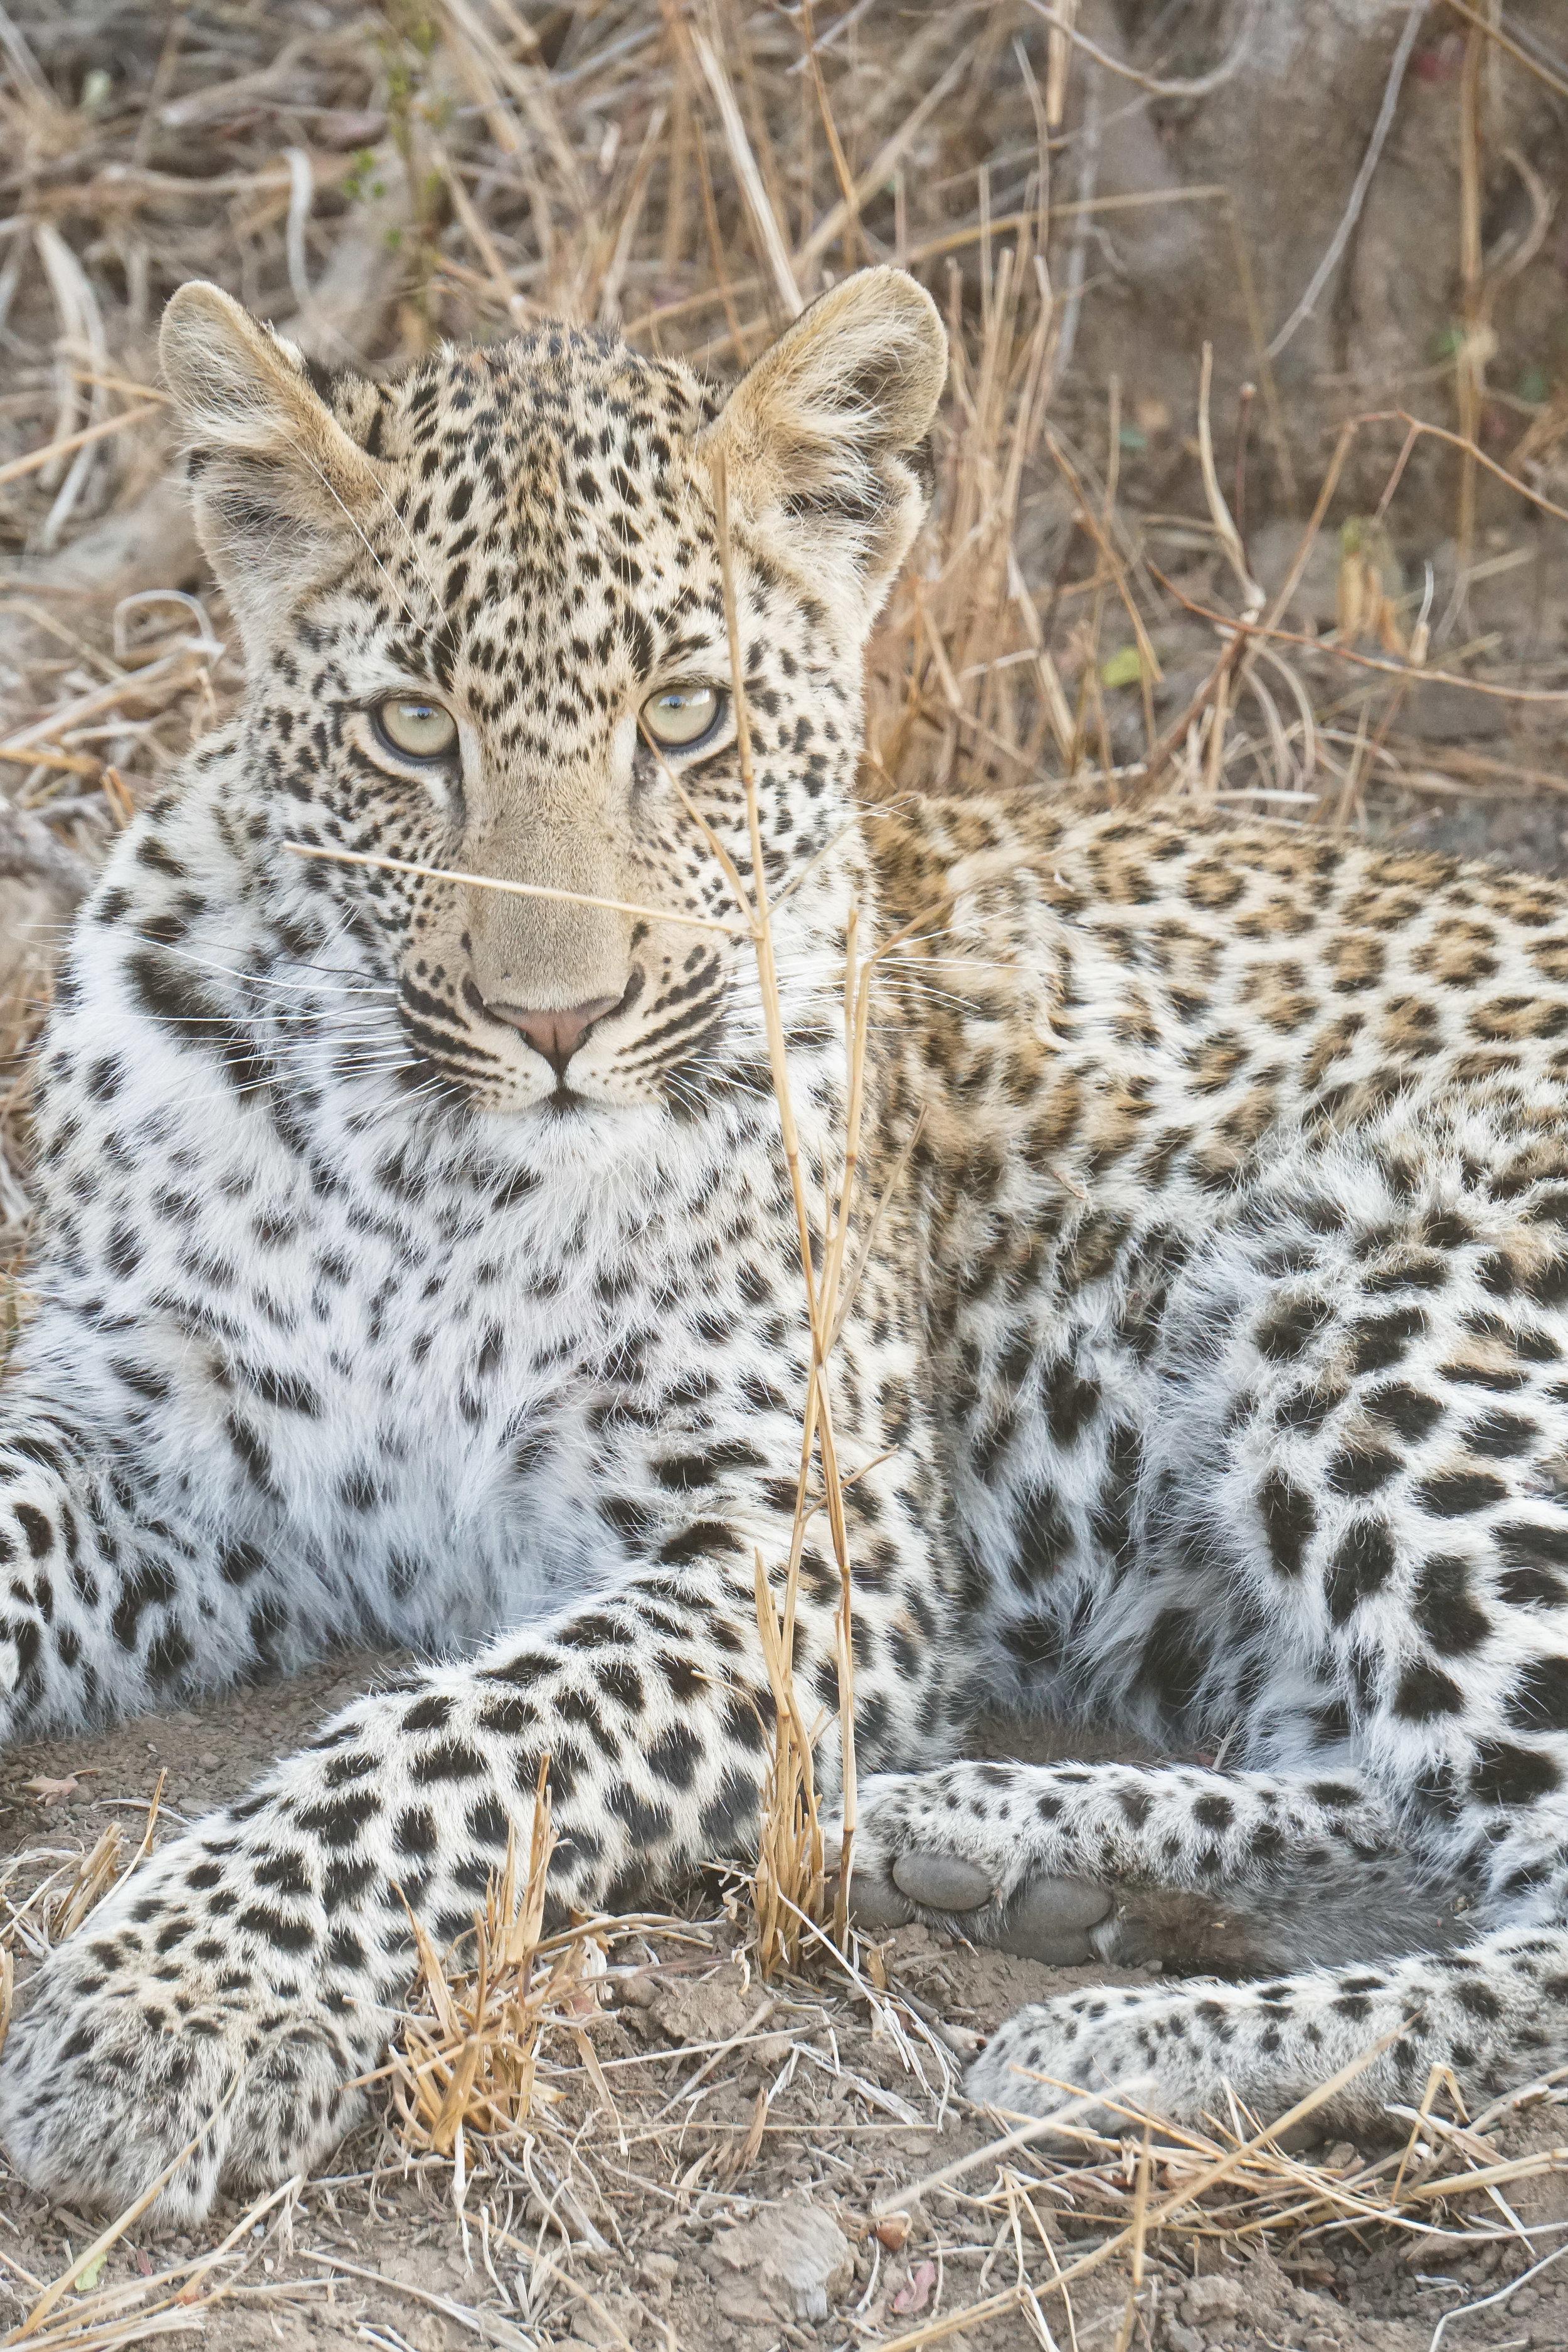 curio.trips.south.africa.safari.leopard.stare.portrait.jpg